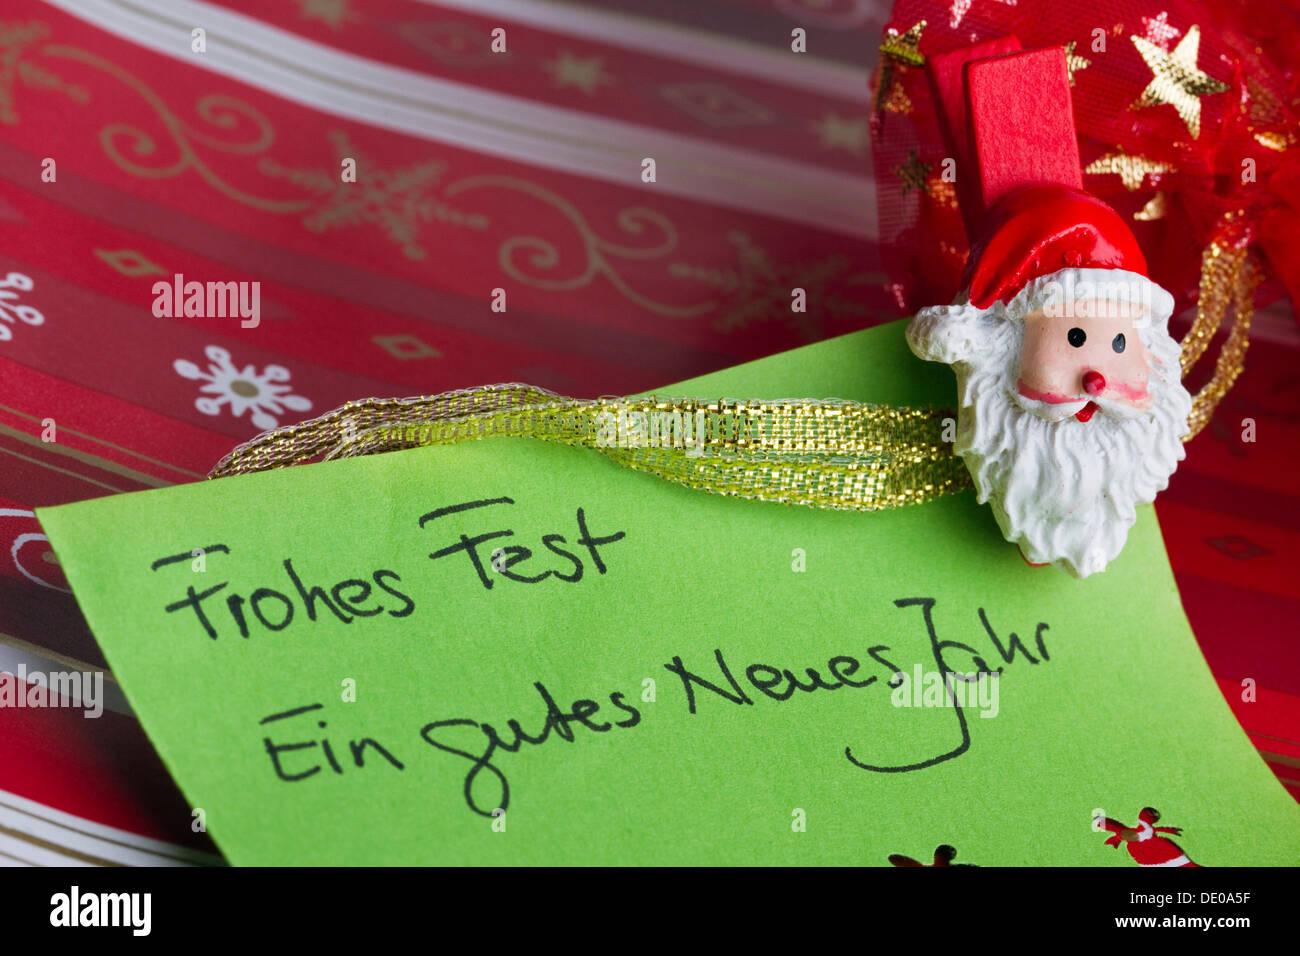 Christmas greeting card, Frohes Fest, Ein gutes neues Jahr, German ...